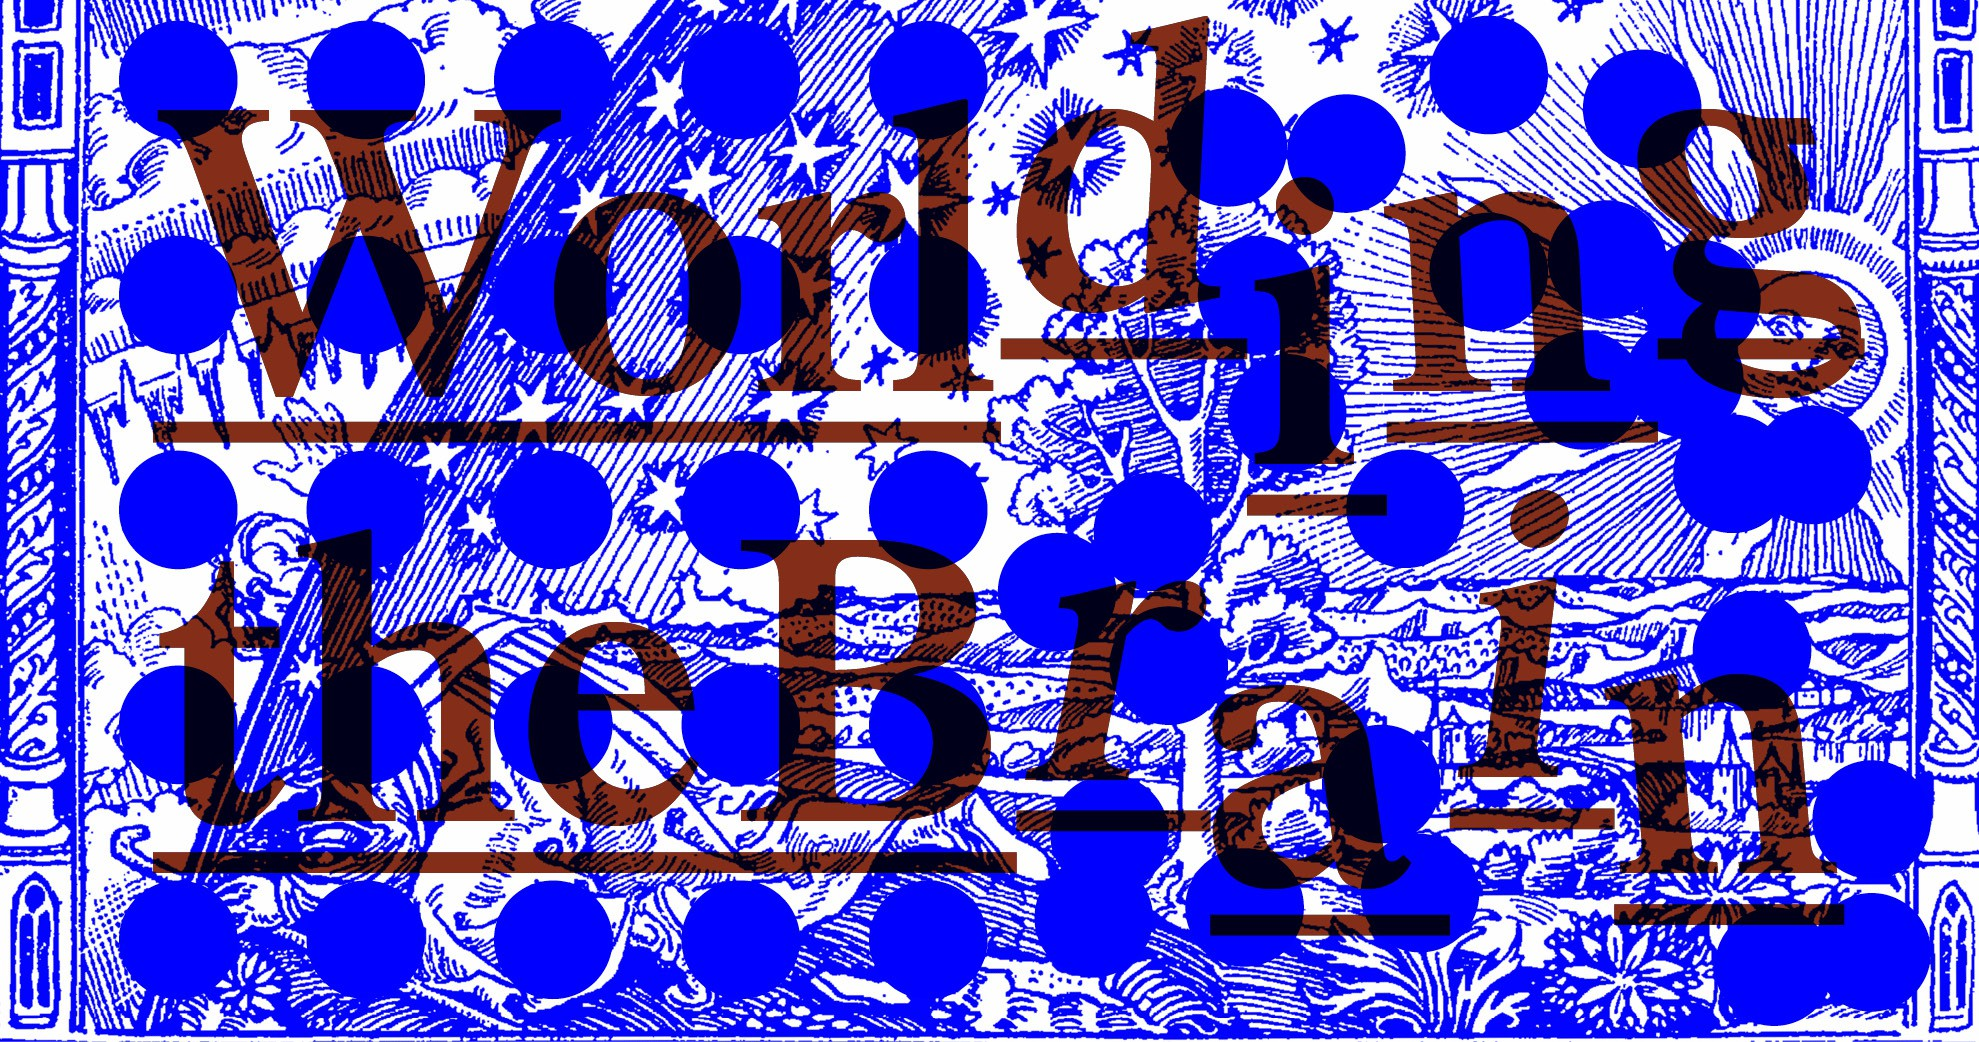 cropped-worlding_banner_alt1.jpg